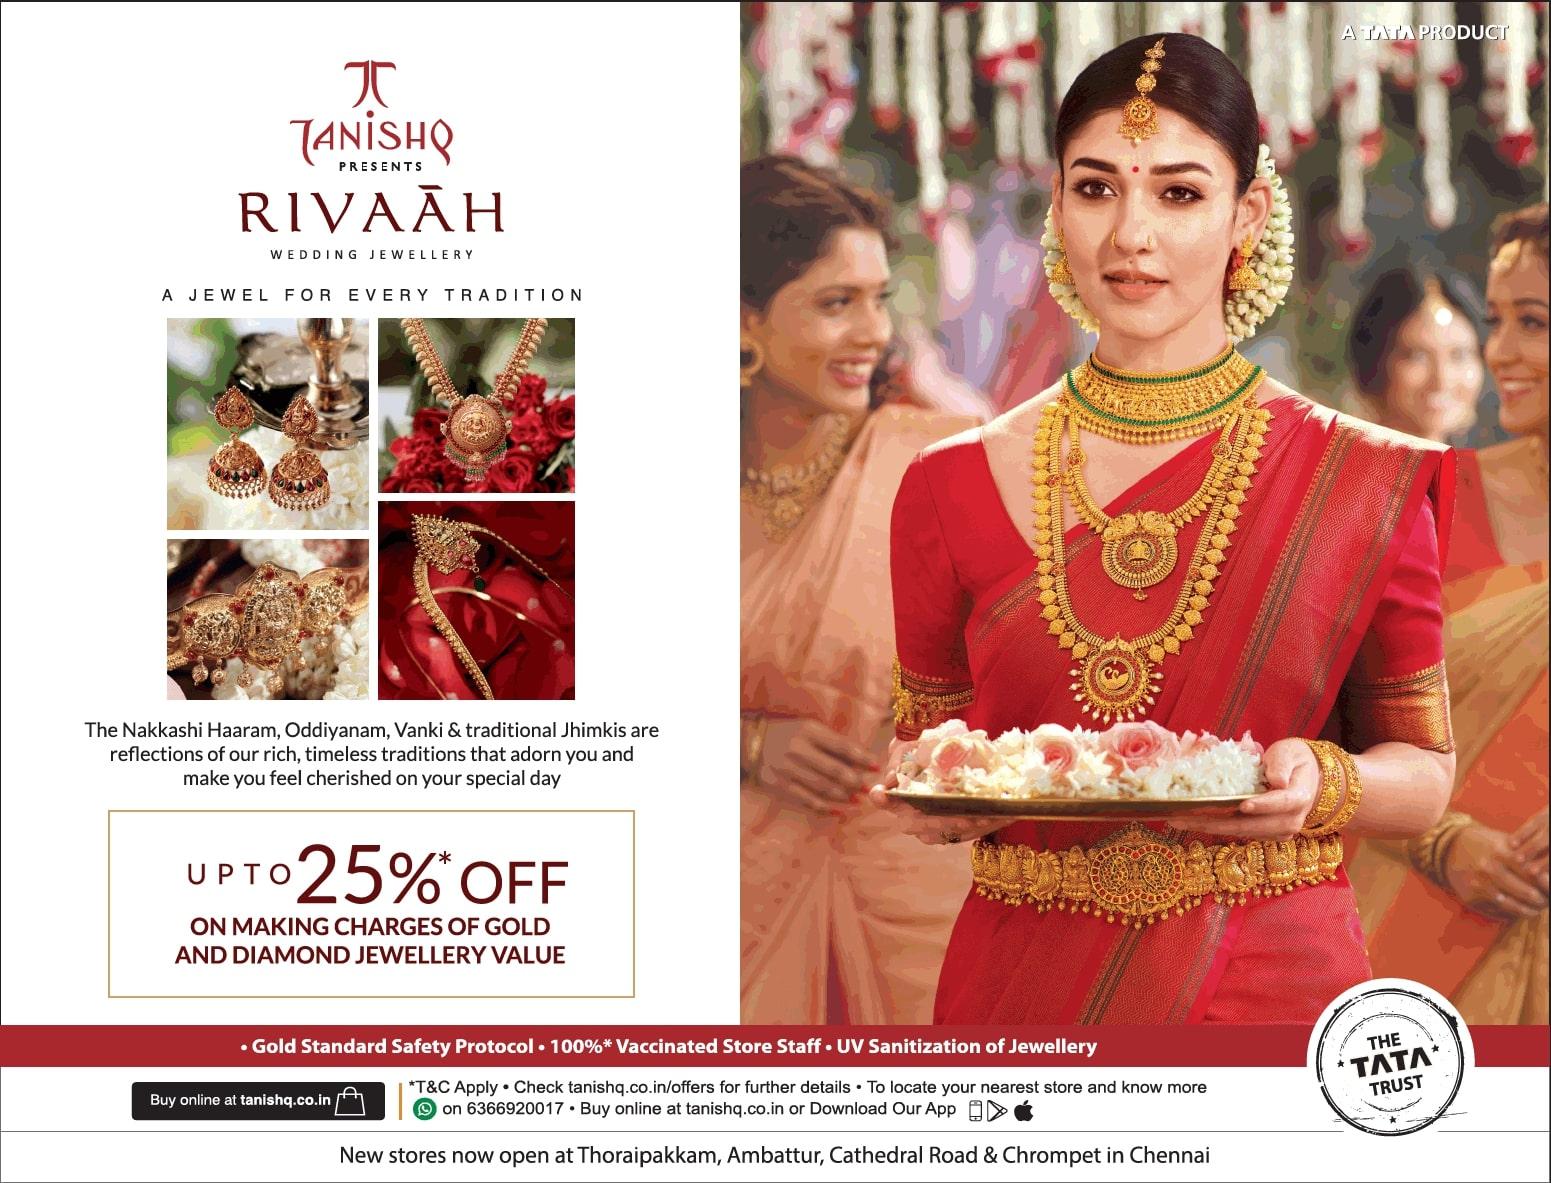 tanishq-rivaah-tamil-wedding-jewellery-the-nakkashi-haaram-oddiyanam-vanki-and-traditional-jhimkis-ad-toi-chennai-1-7-2021